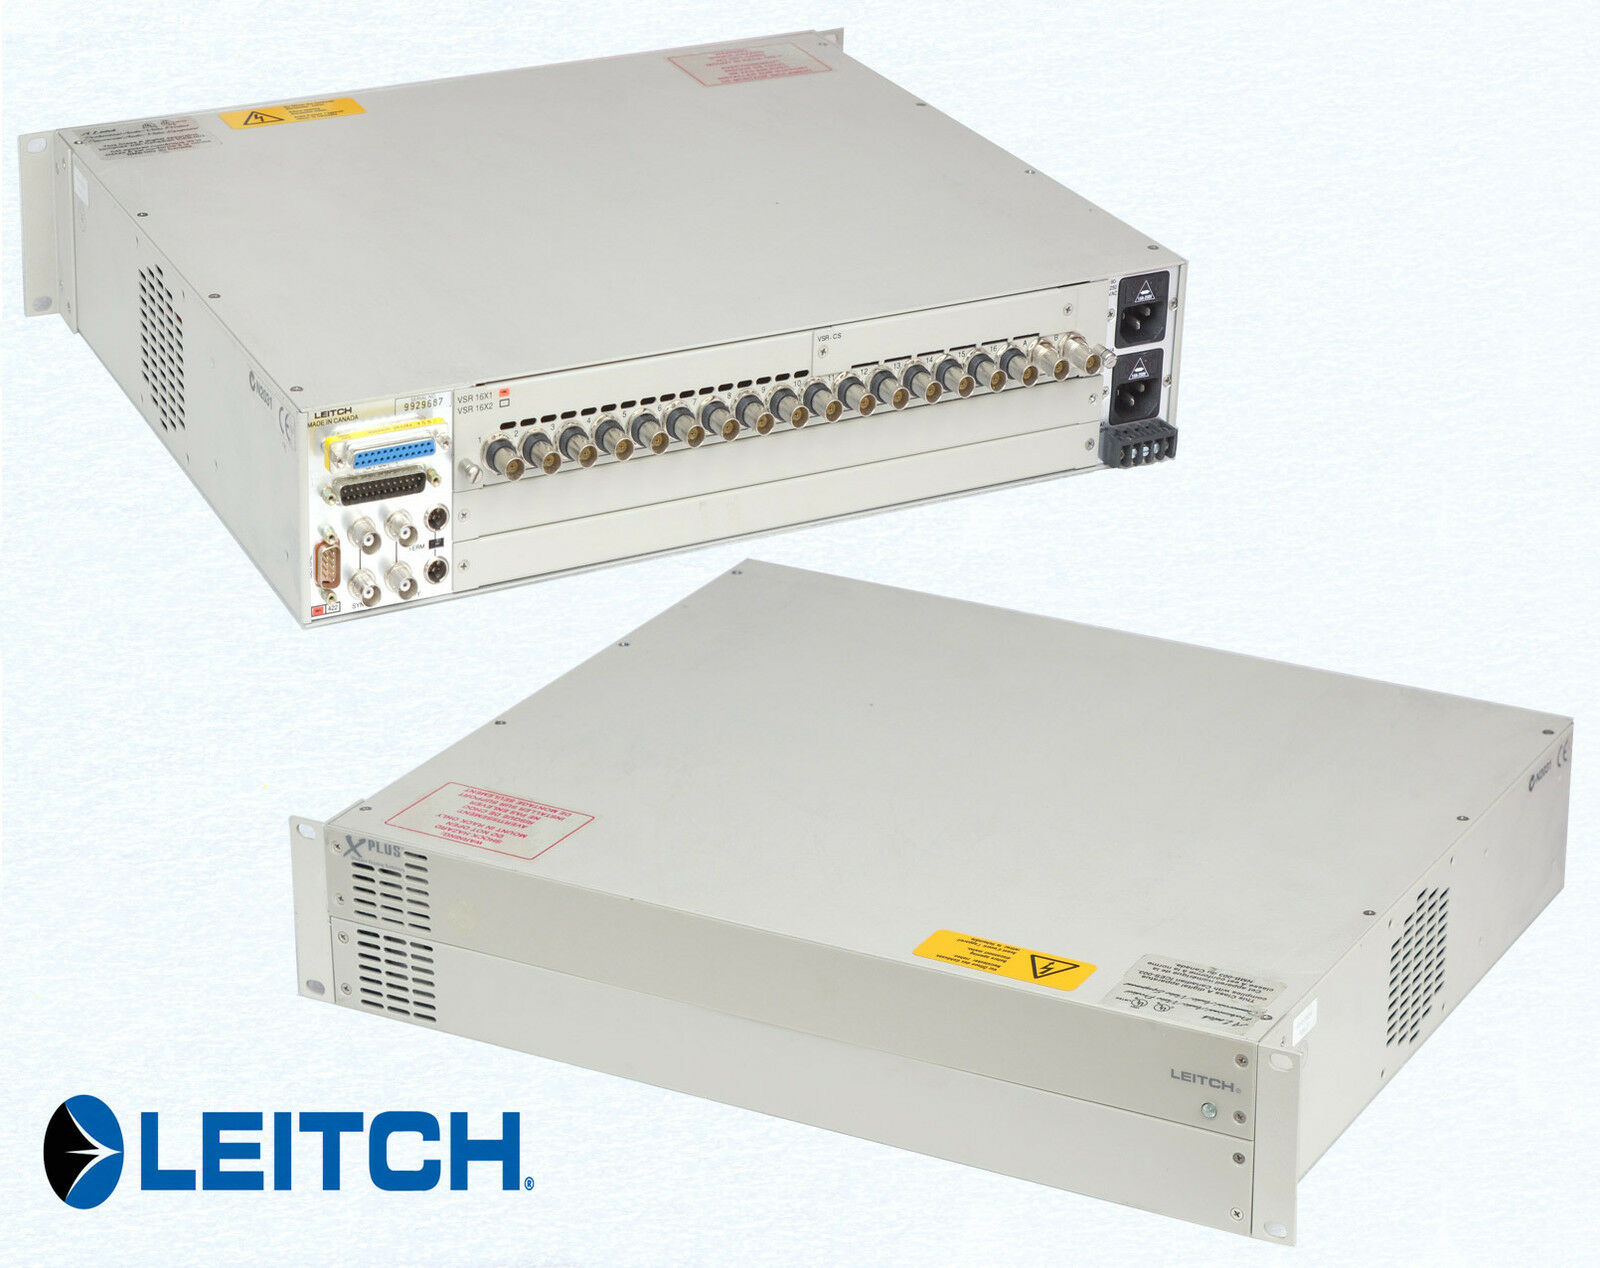 Leitch x plus modular routing switcher VSR16x1 studio equipment O620